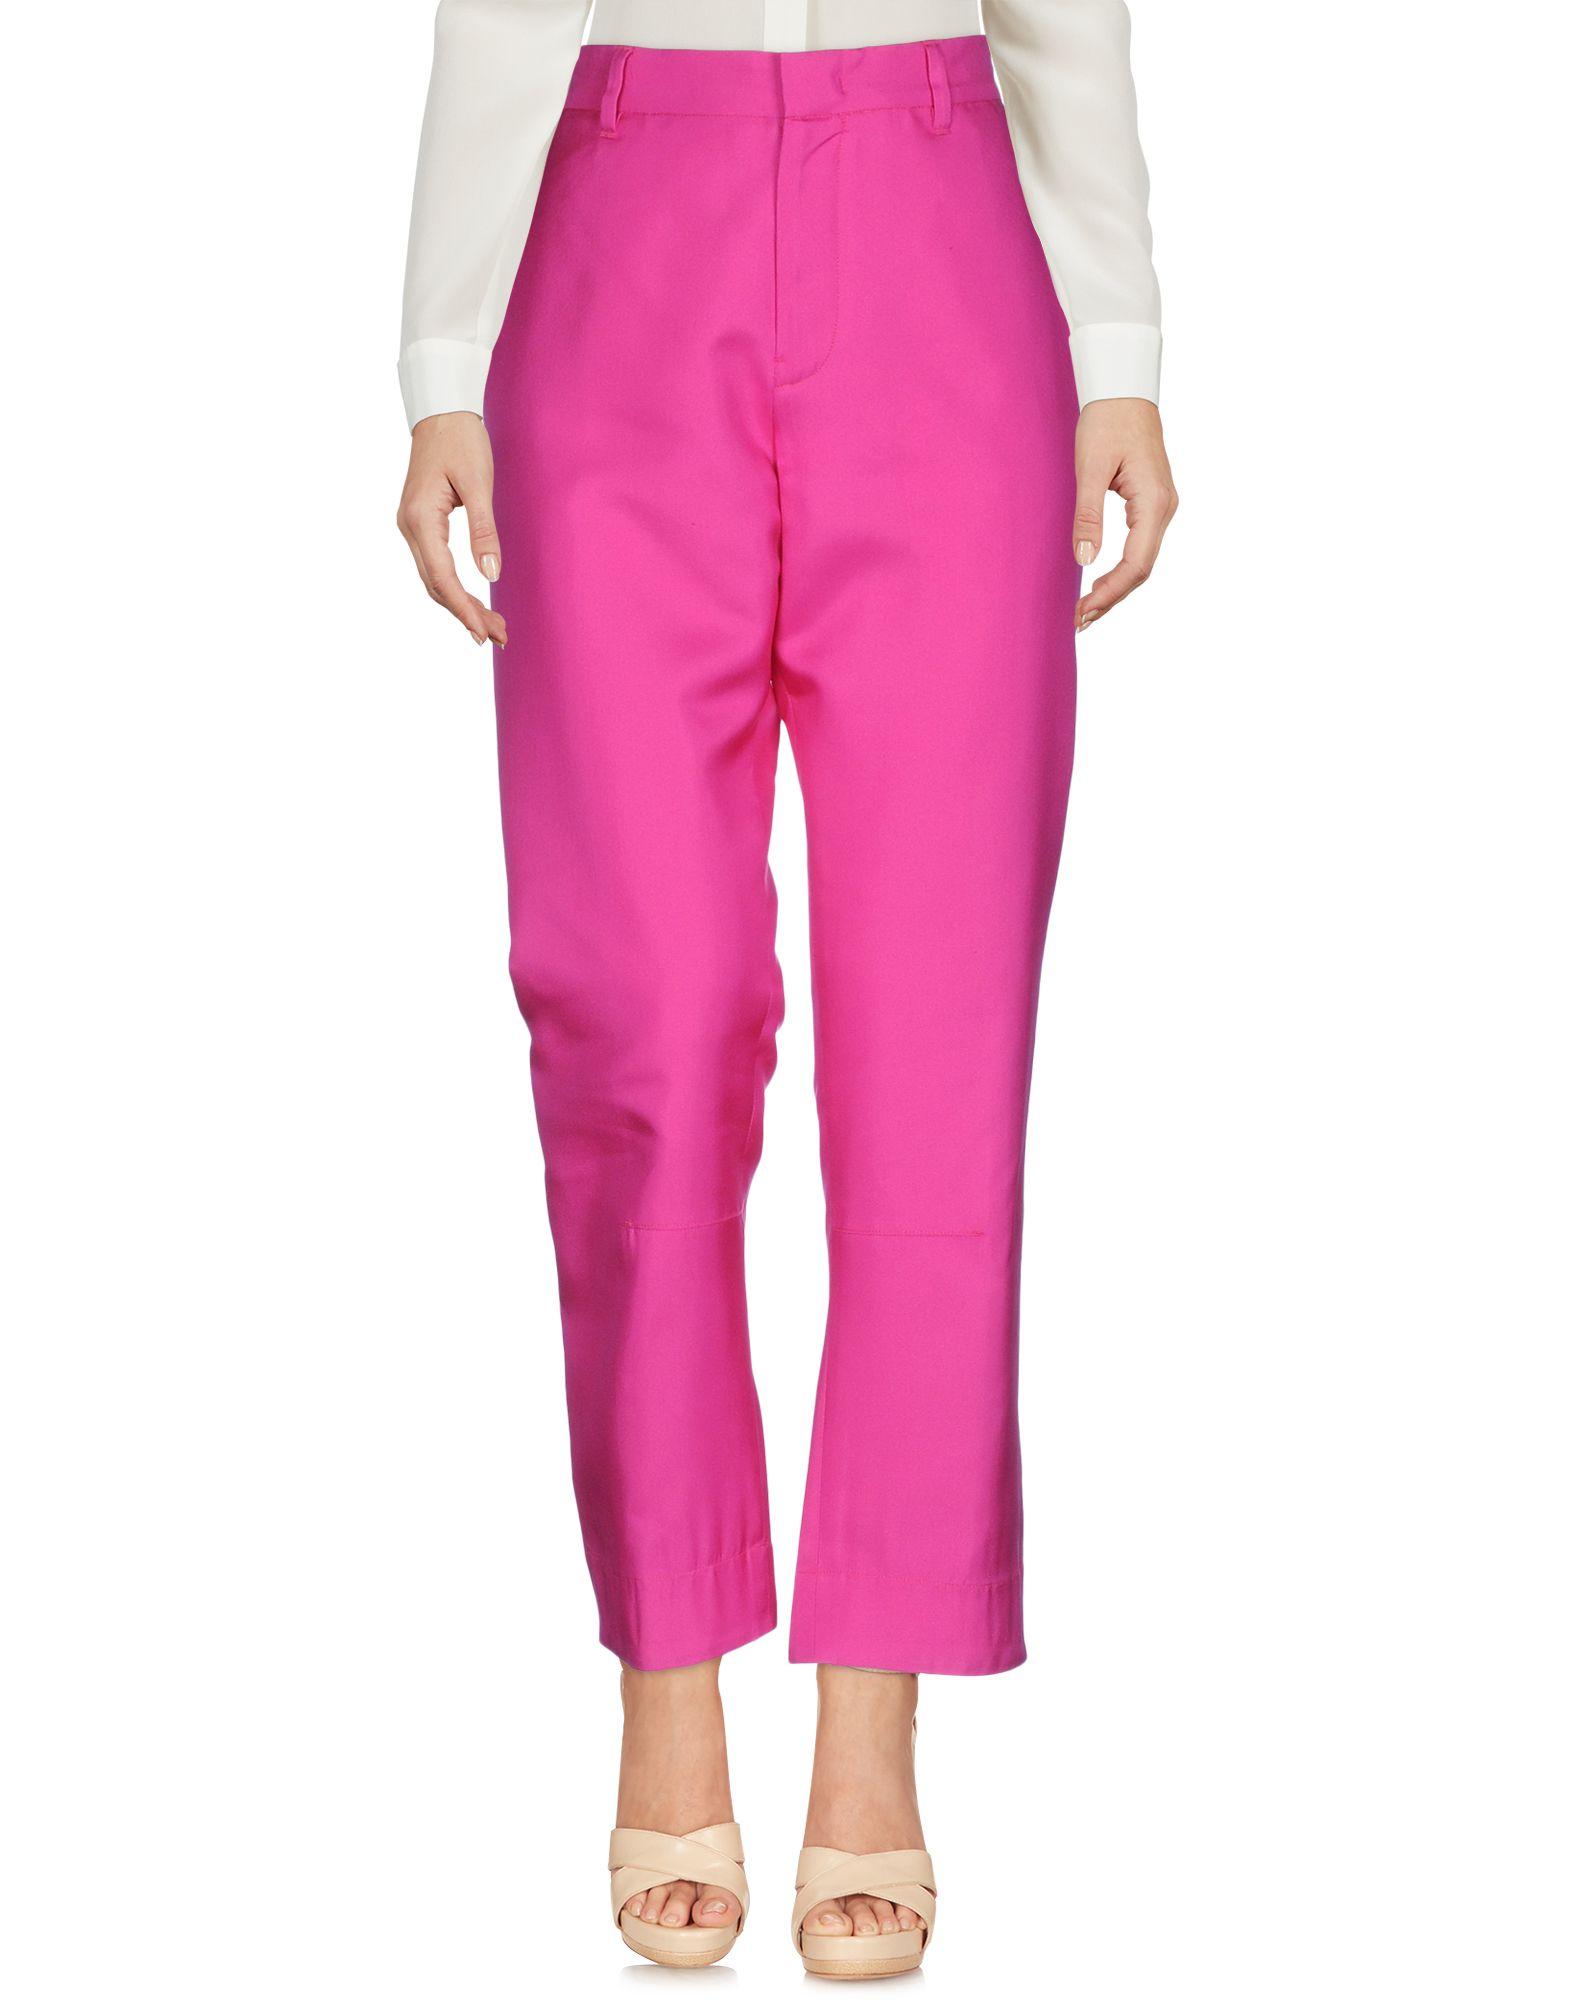 Pantalone Jil Sander Donna - Acquista online su dIYihAMYyX